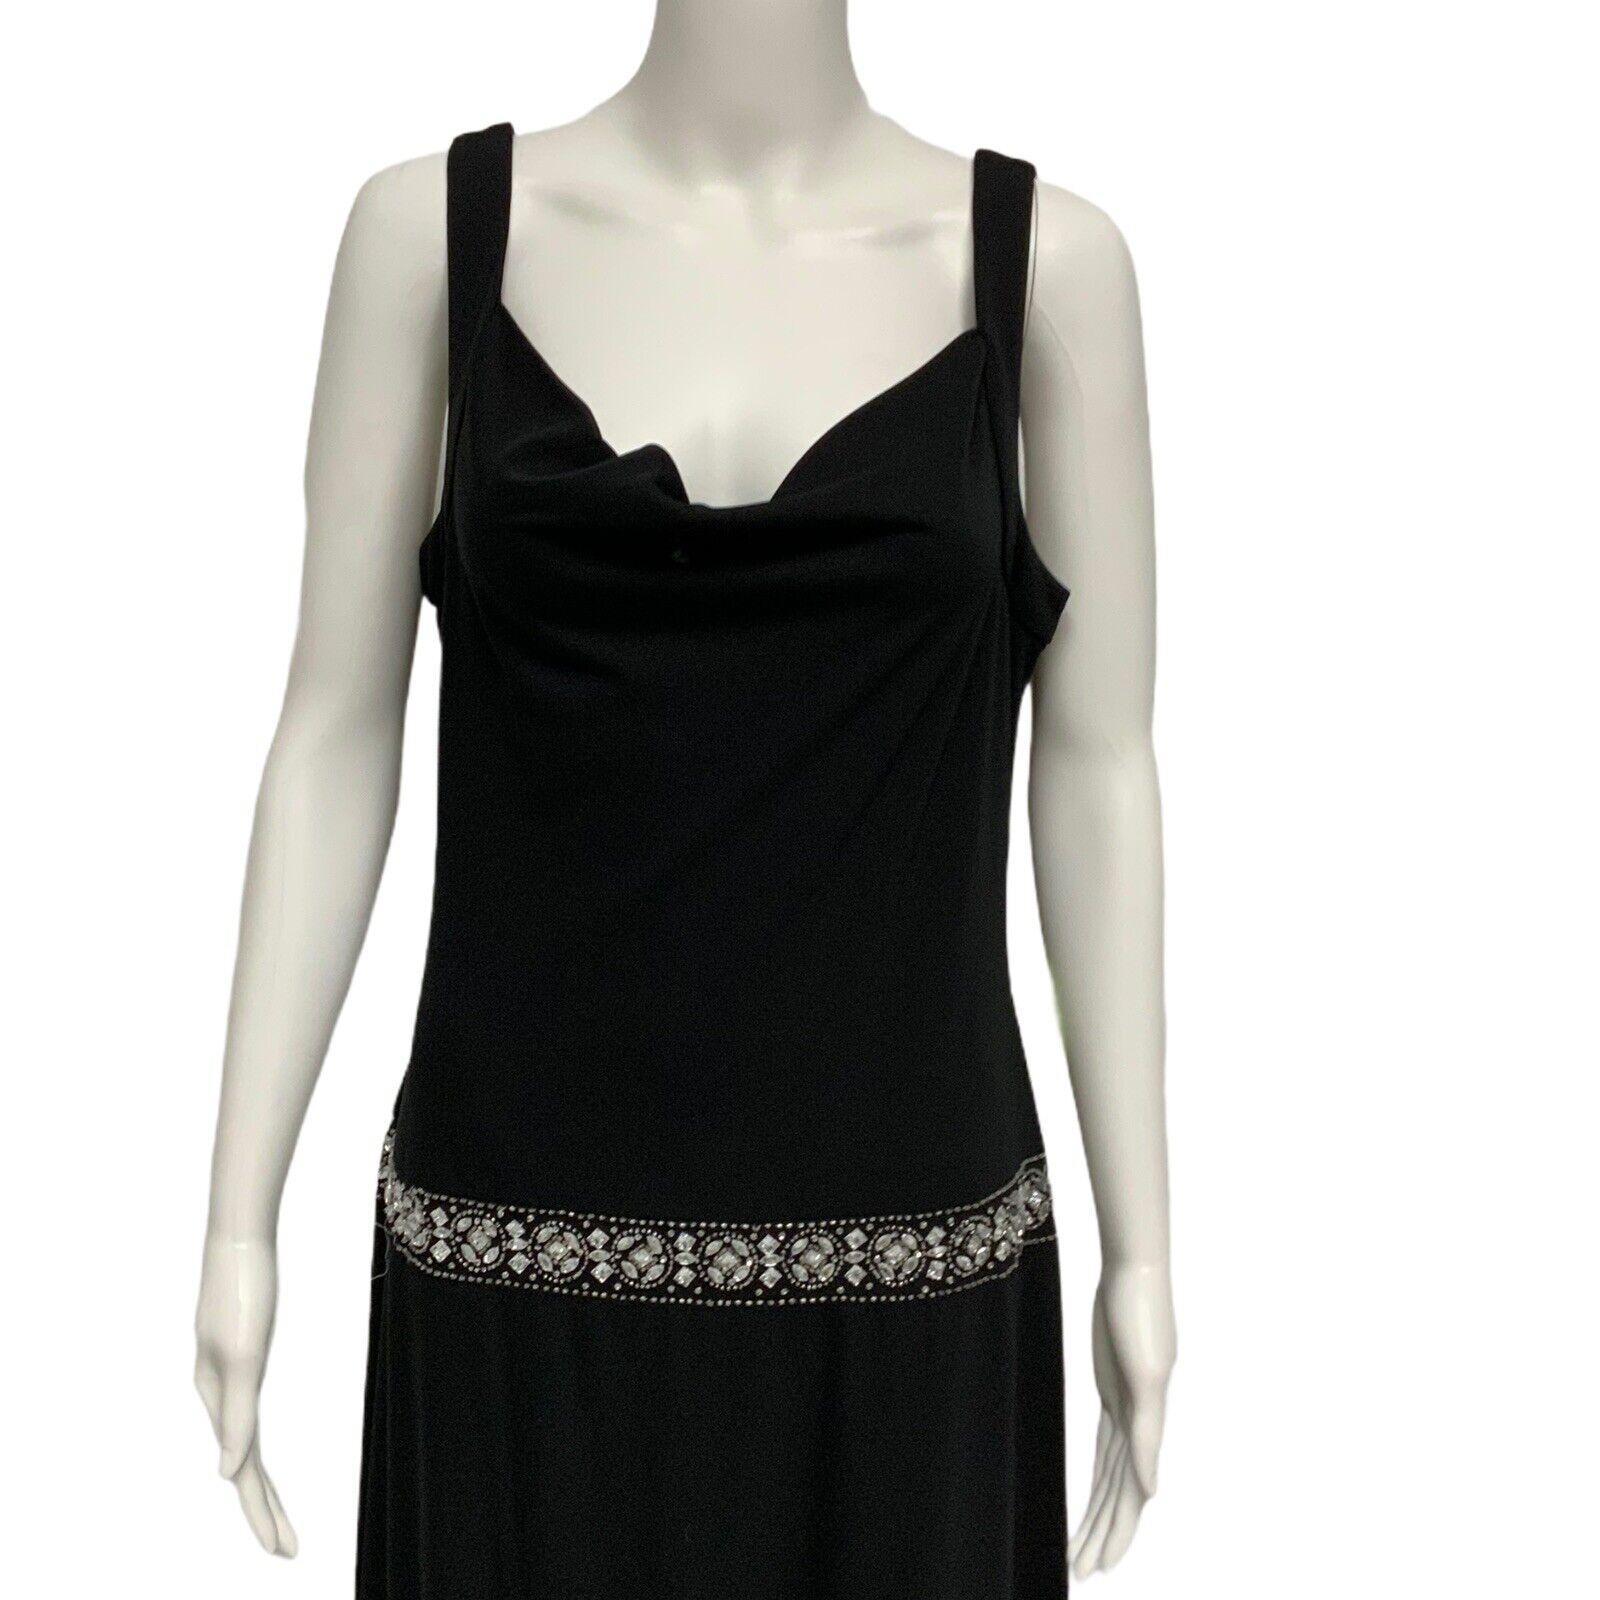 Night Way Collection evening formal dress black sleeveless size 14